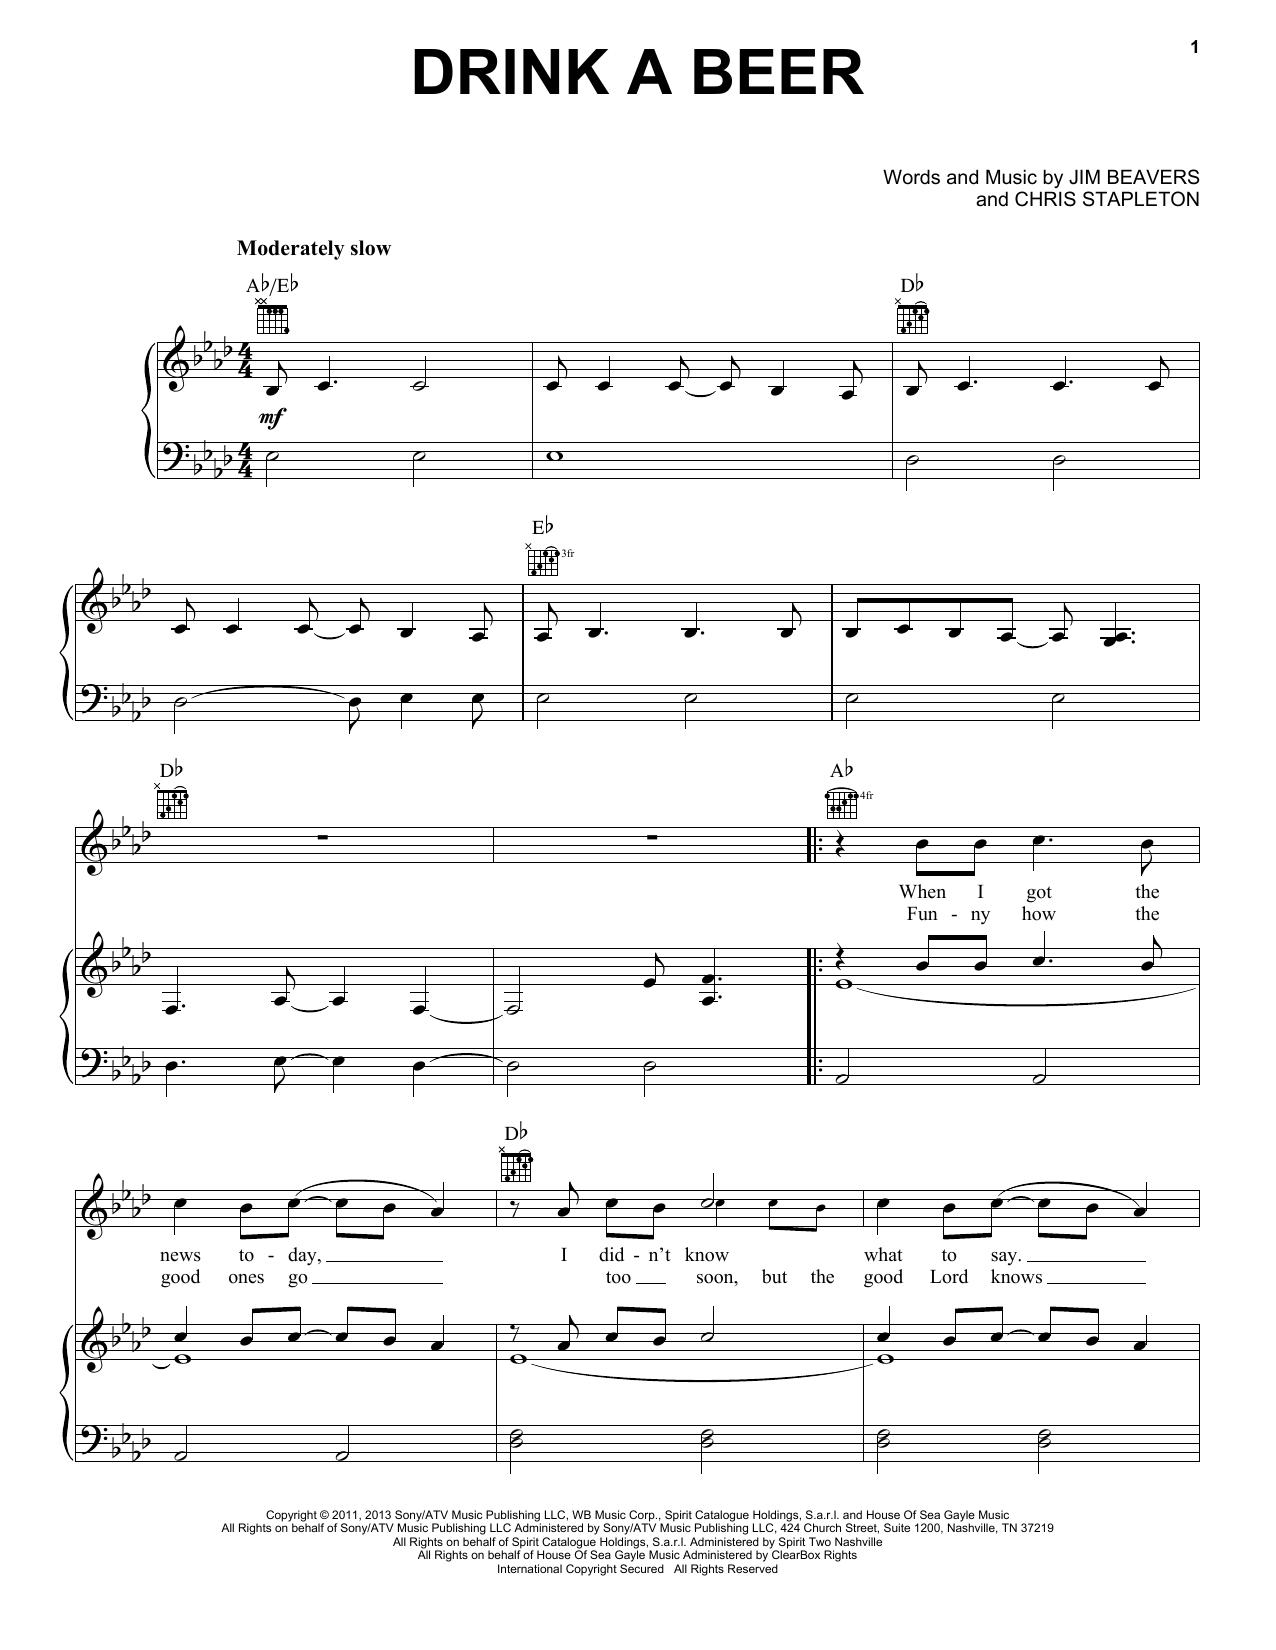 Luke Bryan Drink A Beer sheet music notes and chords. Download Printable PDF.